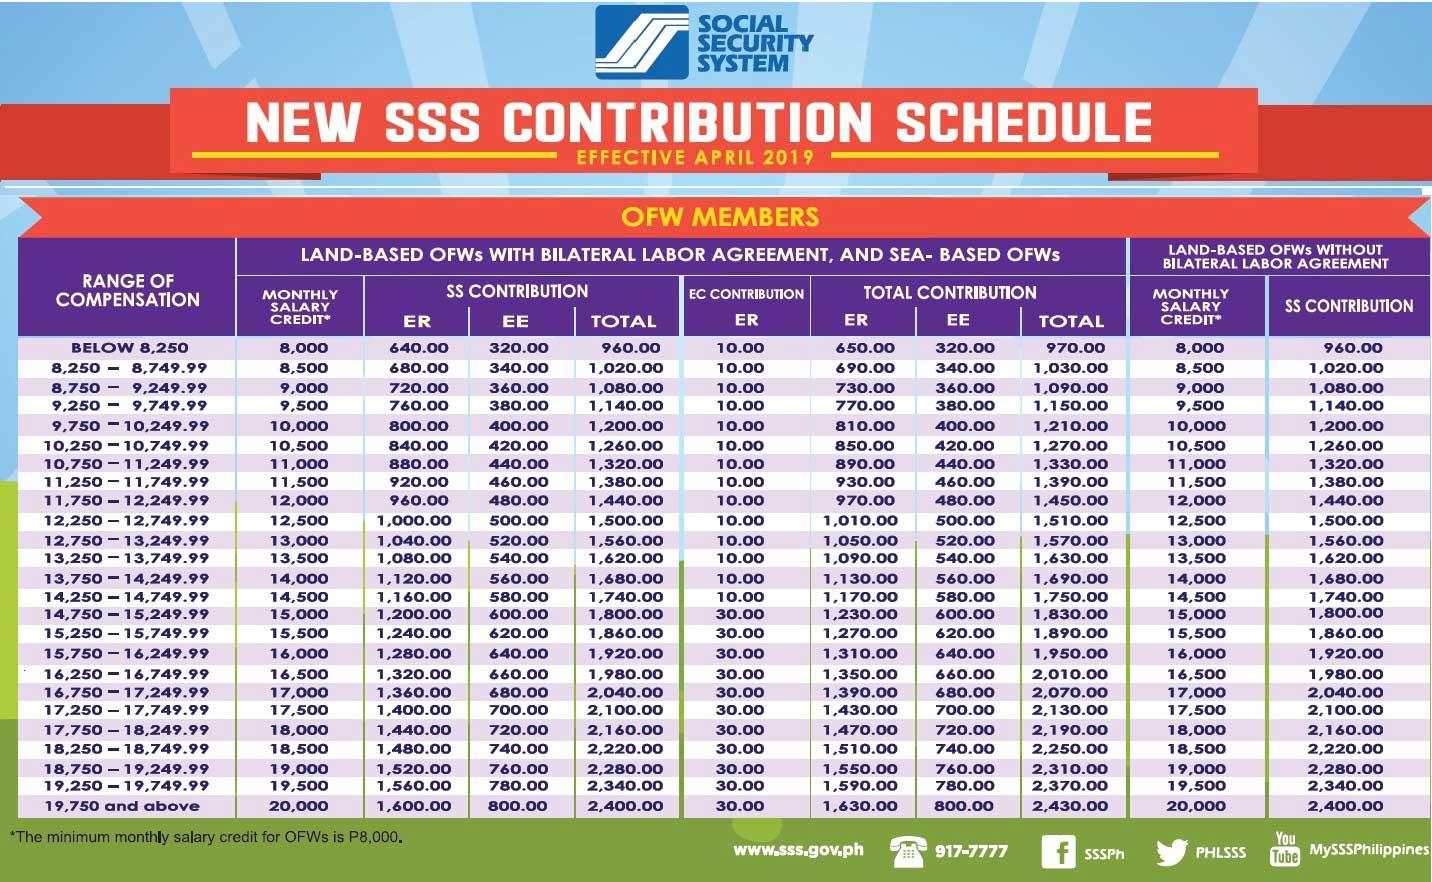 sss contribution 2019 ofw